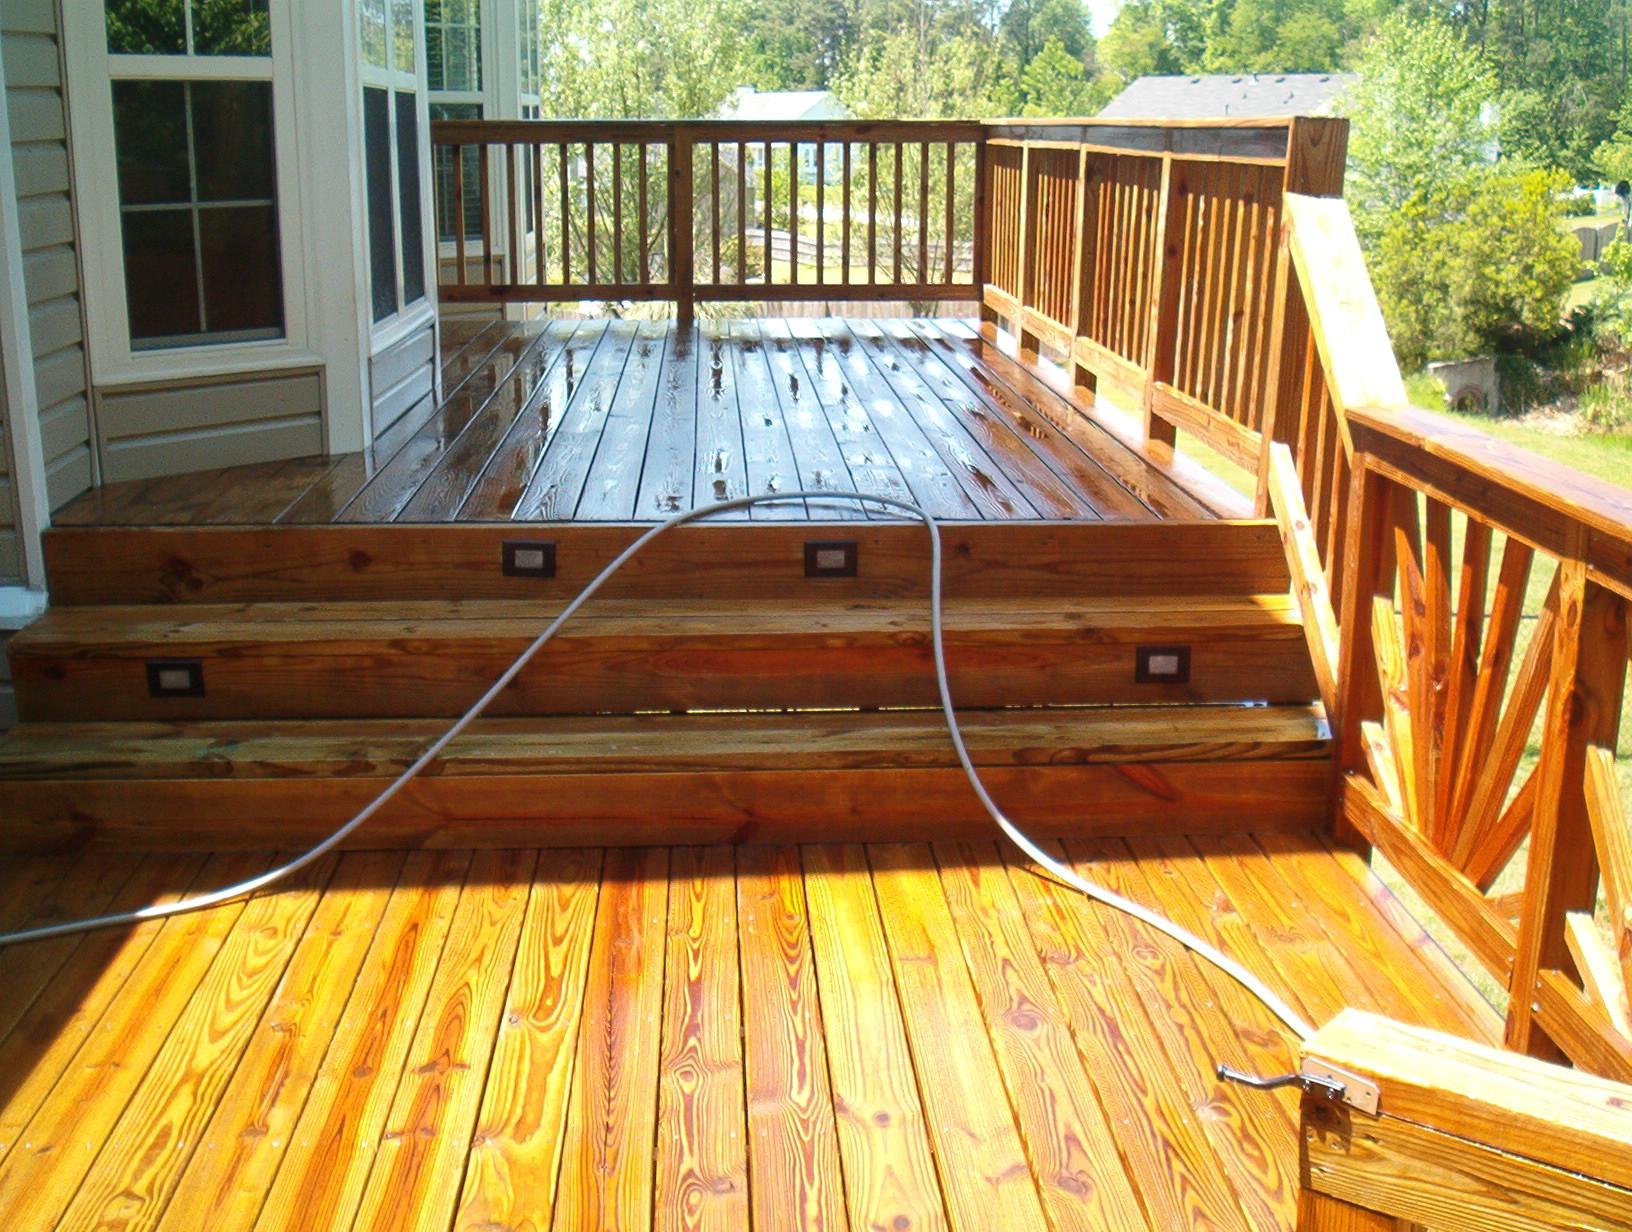 Power washing a deck - Deck Half Cleaned_full Pressure Washing